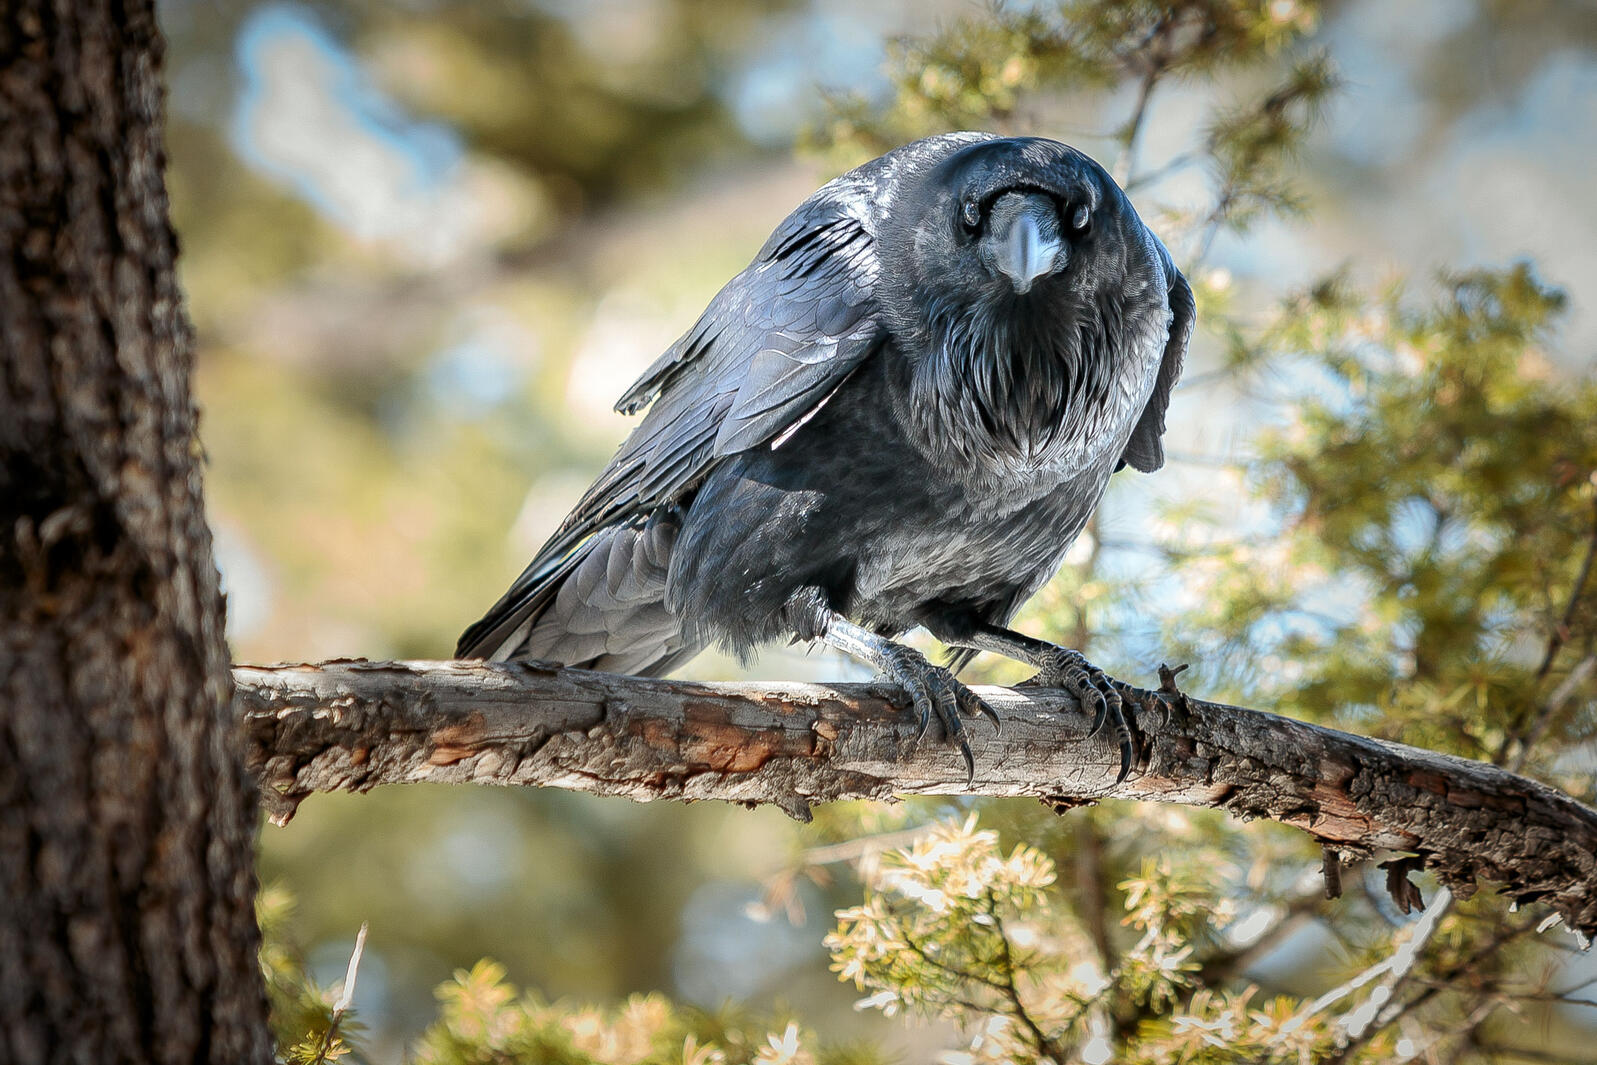 Common Raven. Doug Kliewer/Audubon Photography Awards